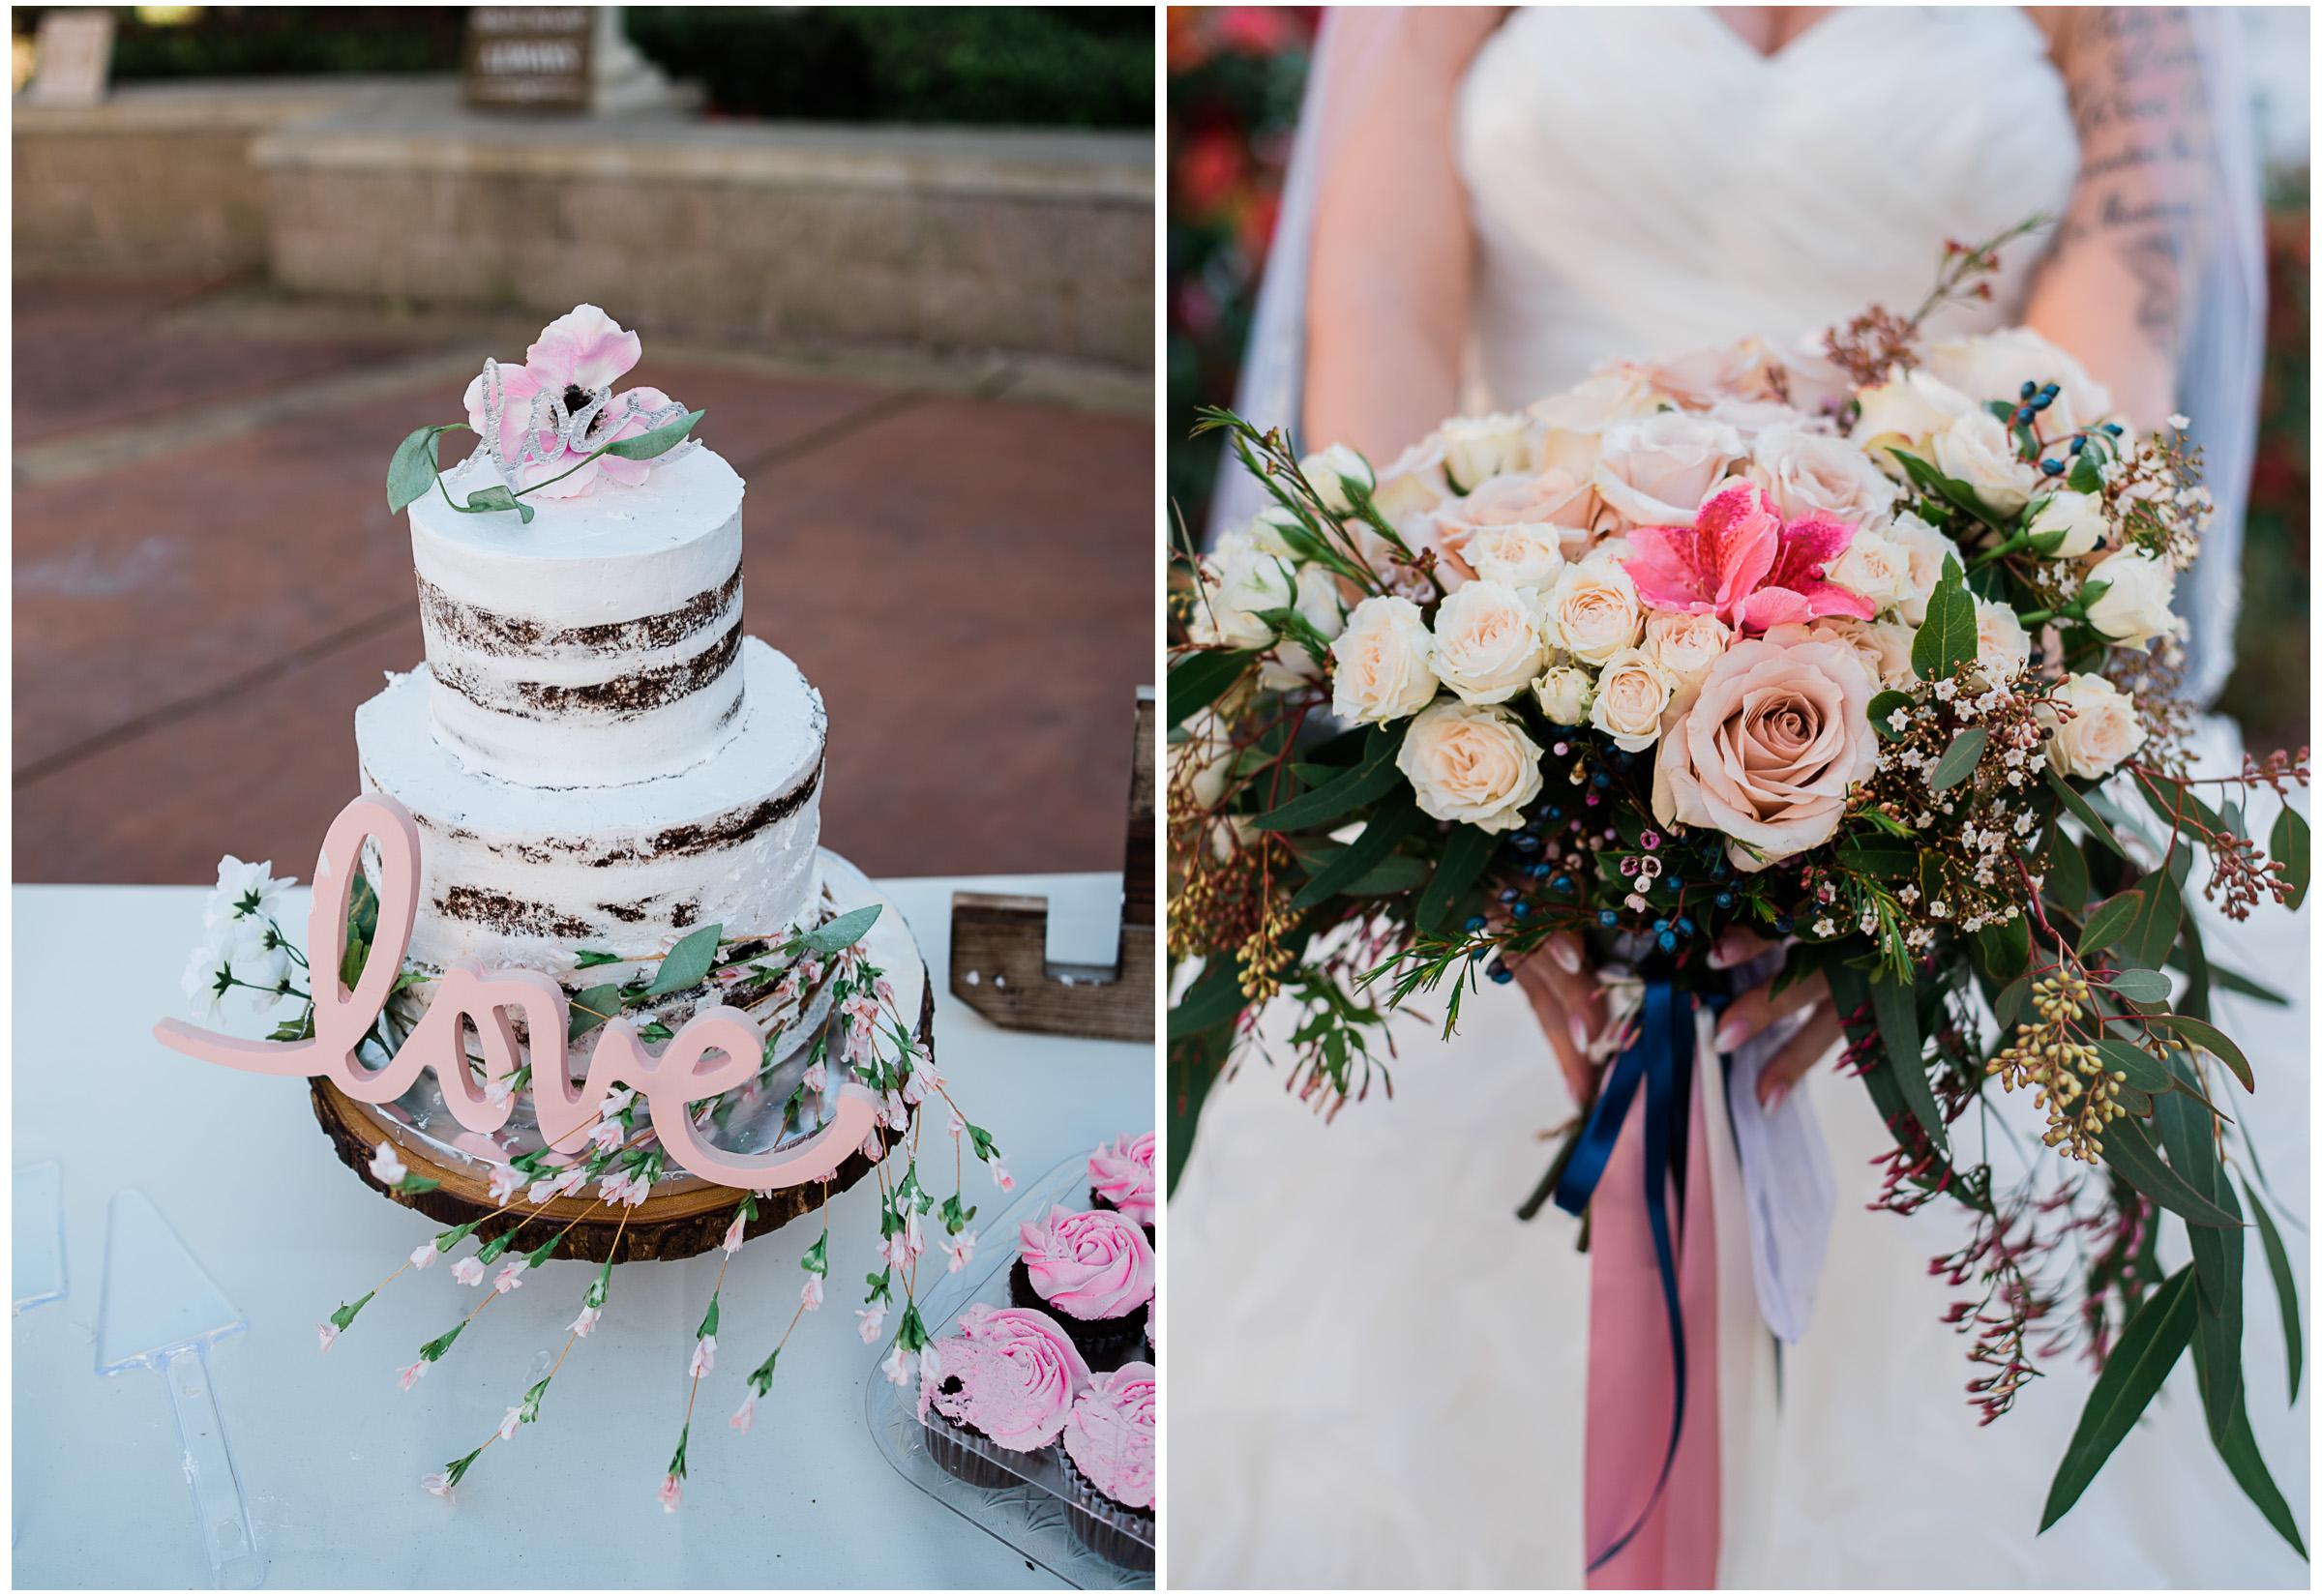 Sacramento Wedding - Sacramento Photographer - Justin Wilcox Photography - 17.jpg